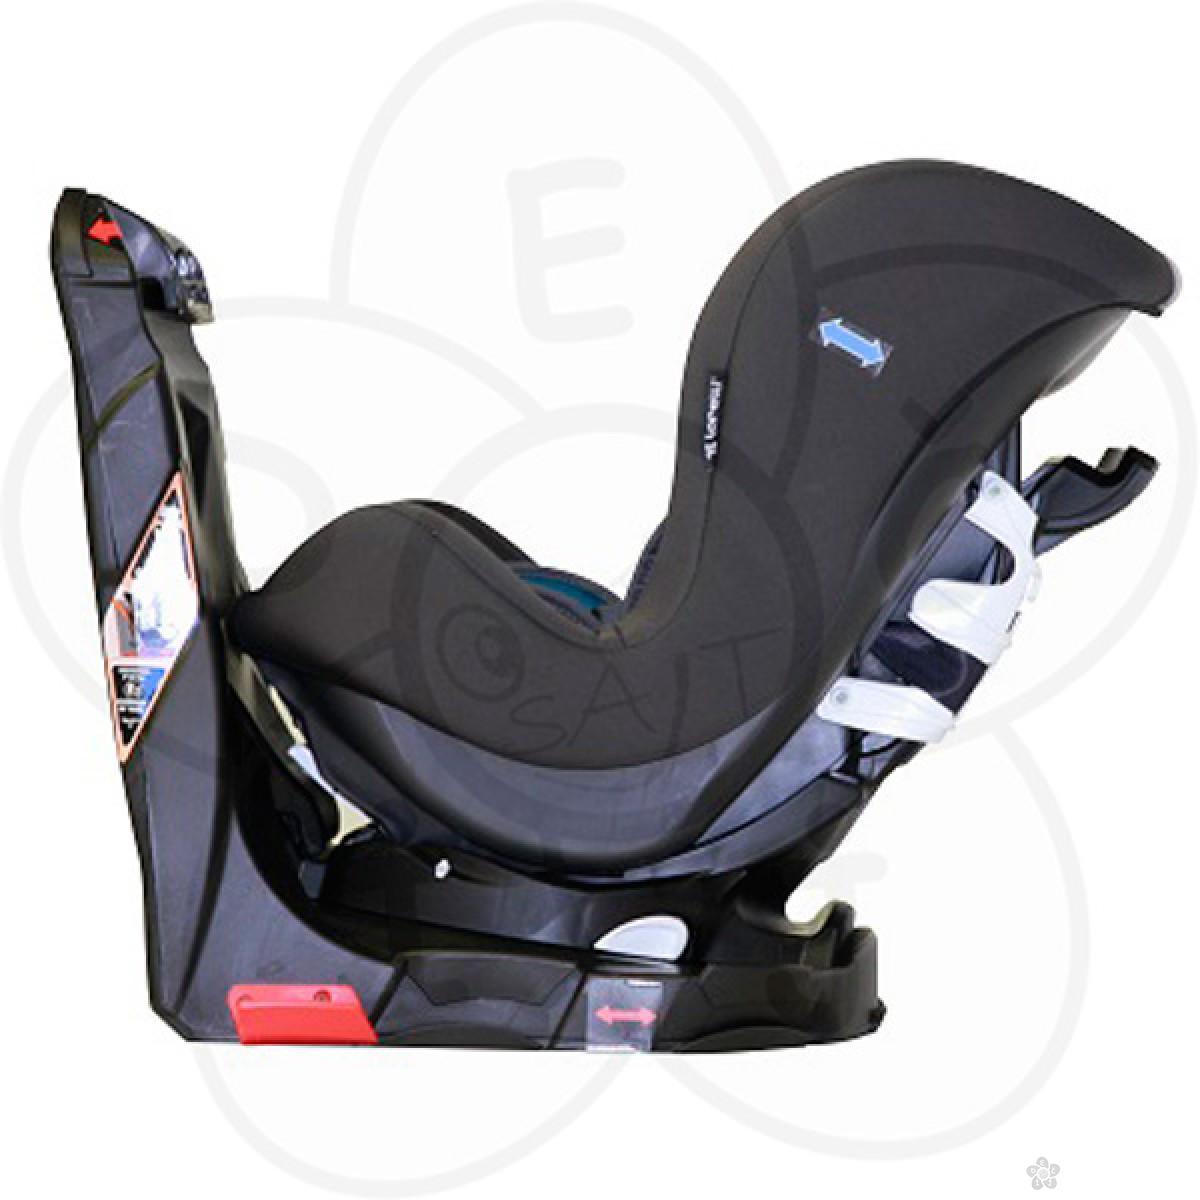 Auto Sedište Revo Lux - Agora Storm 0-18kg, 10070971574